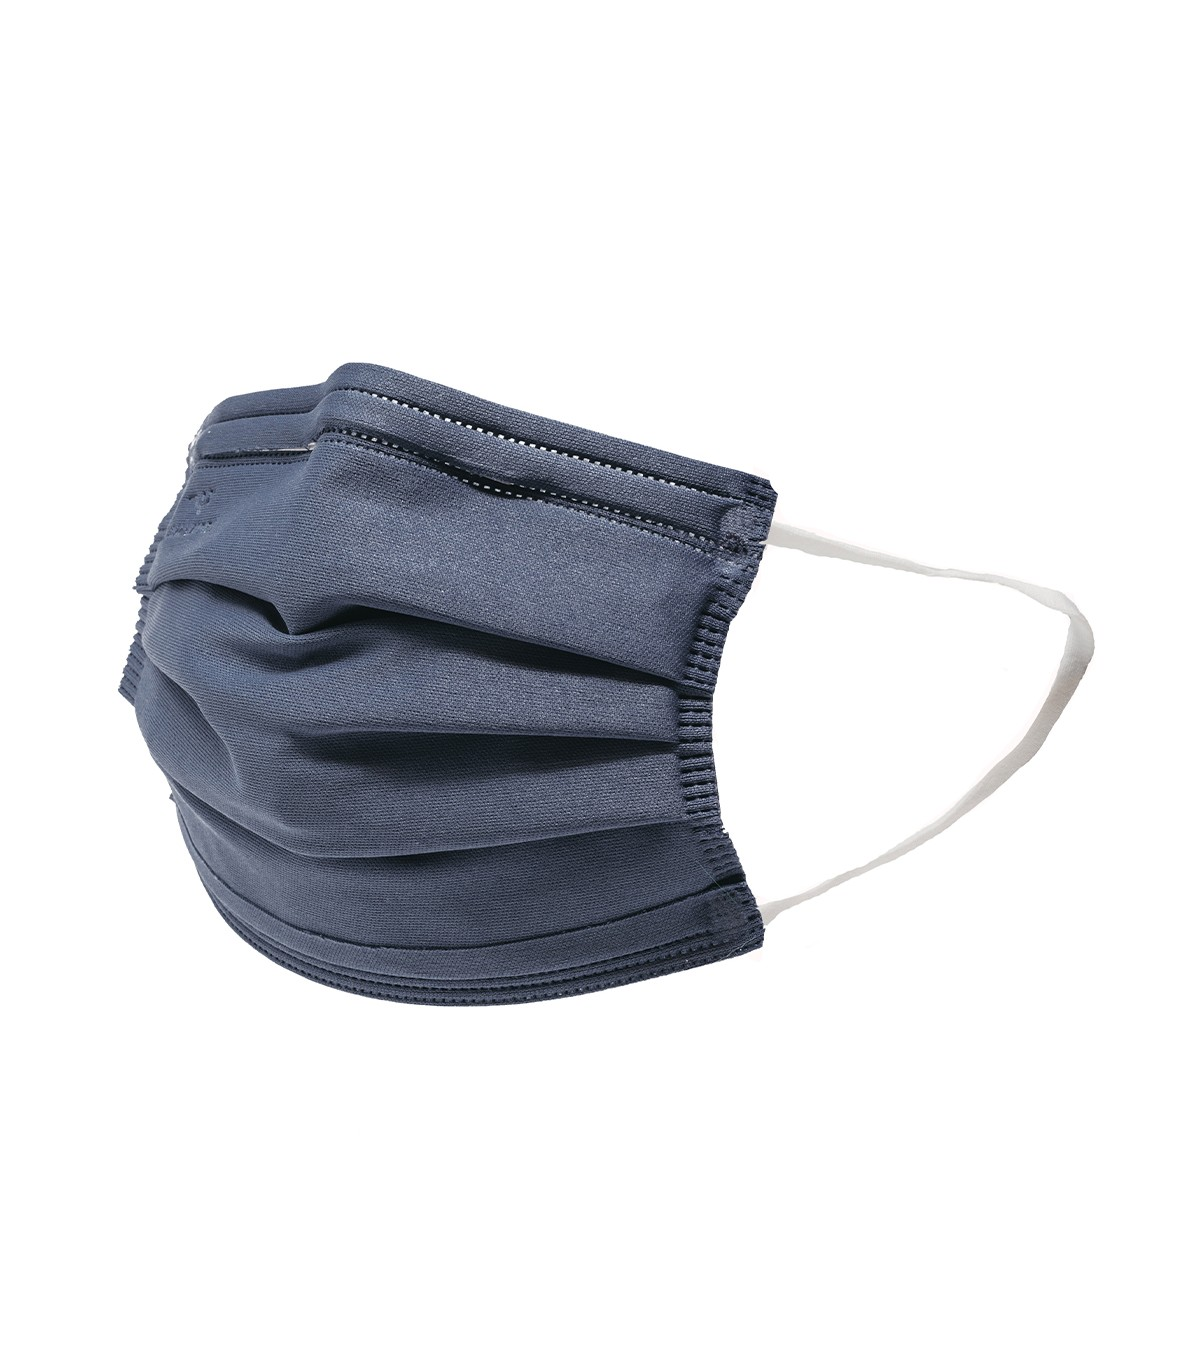 Mascarilla quirúrgica textil reutilizable - azul marino